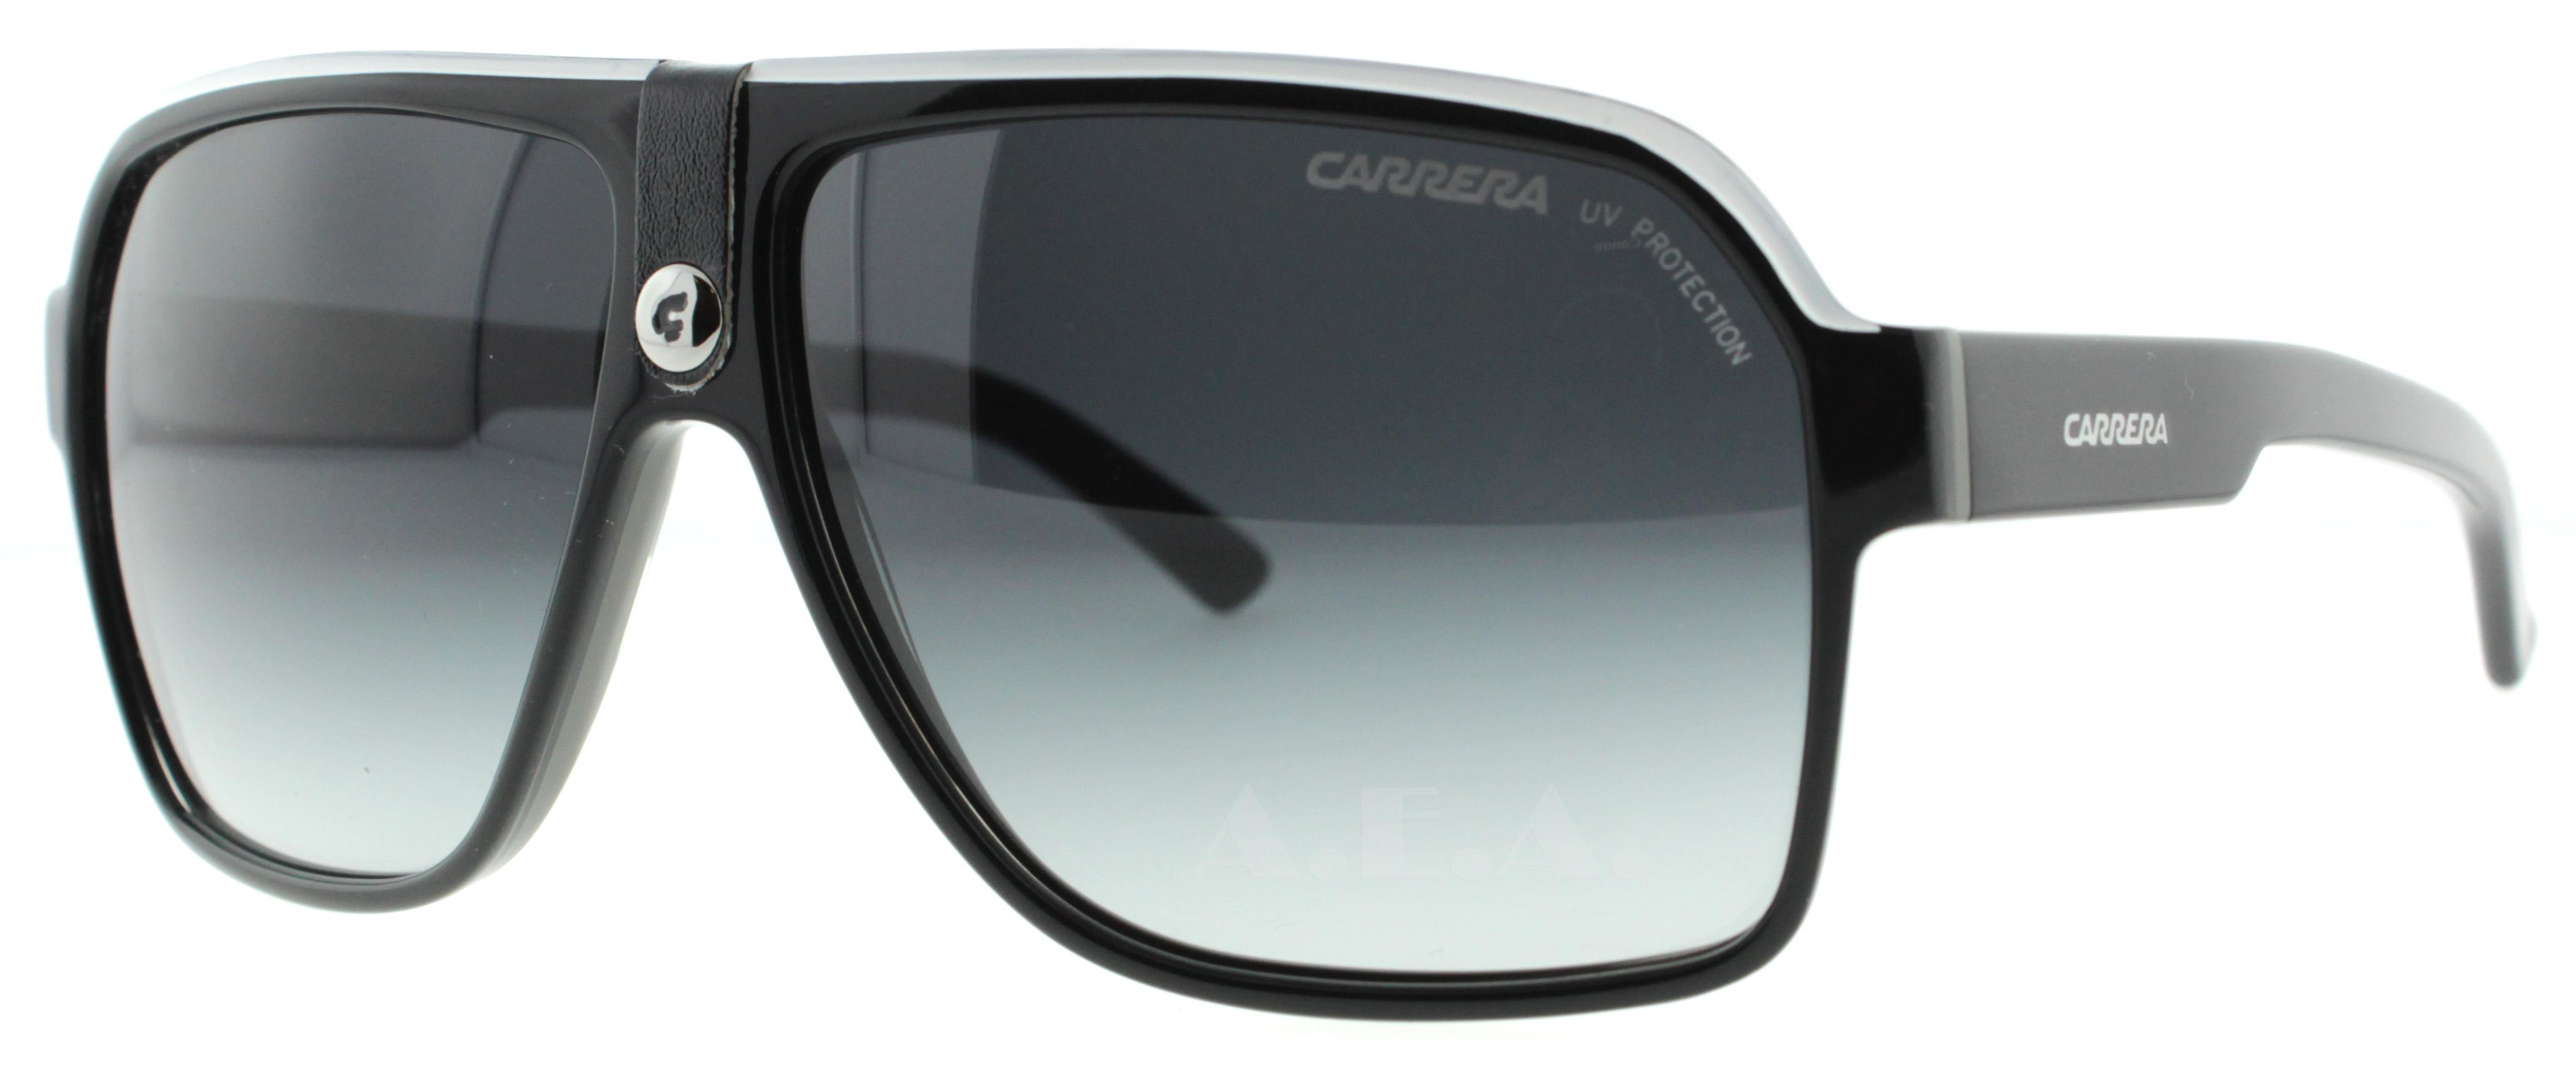 ab989f91fb2f3 Carrera 33 s Aviator Sunglasses